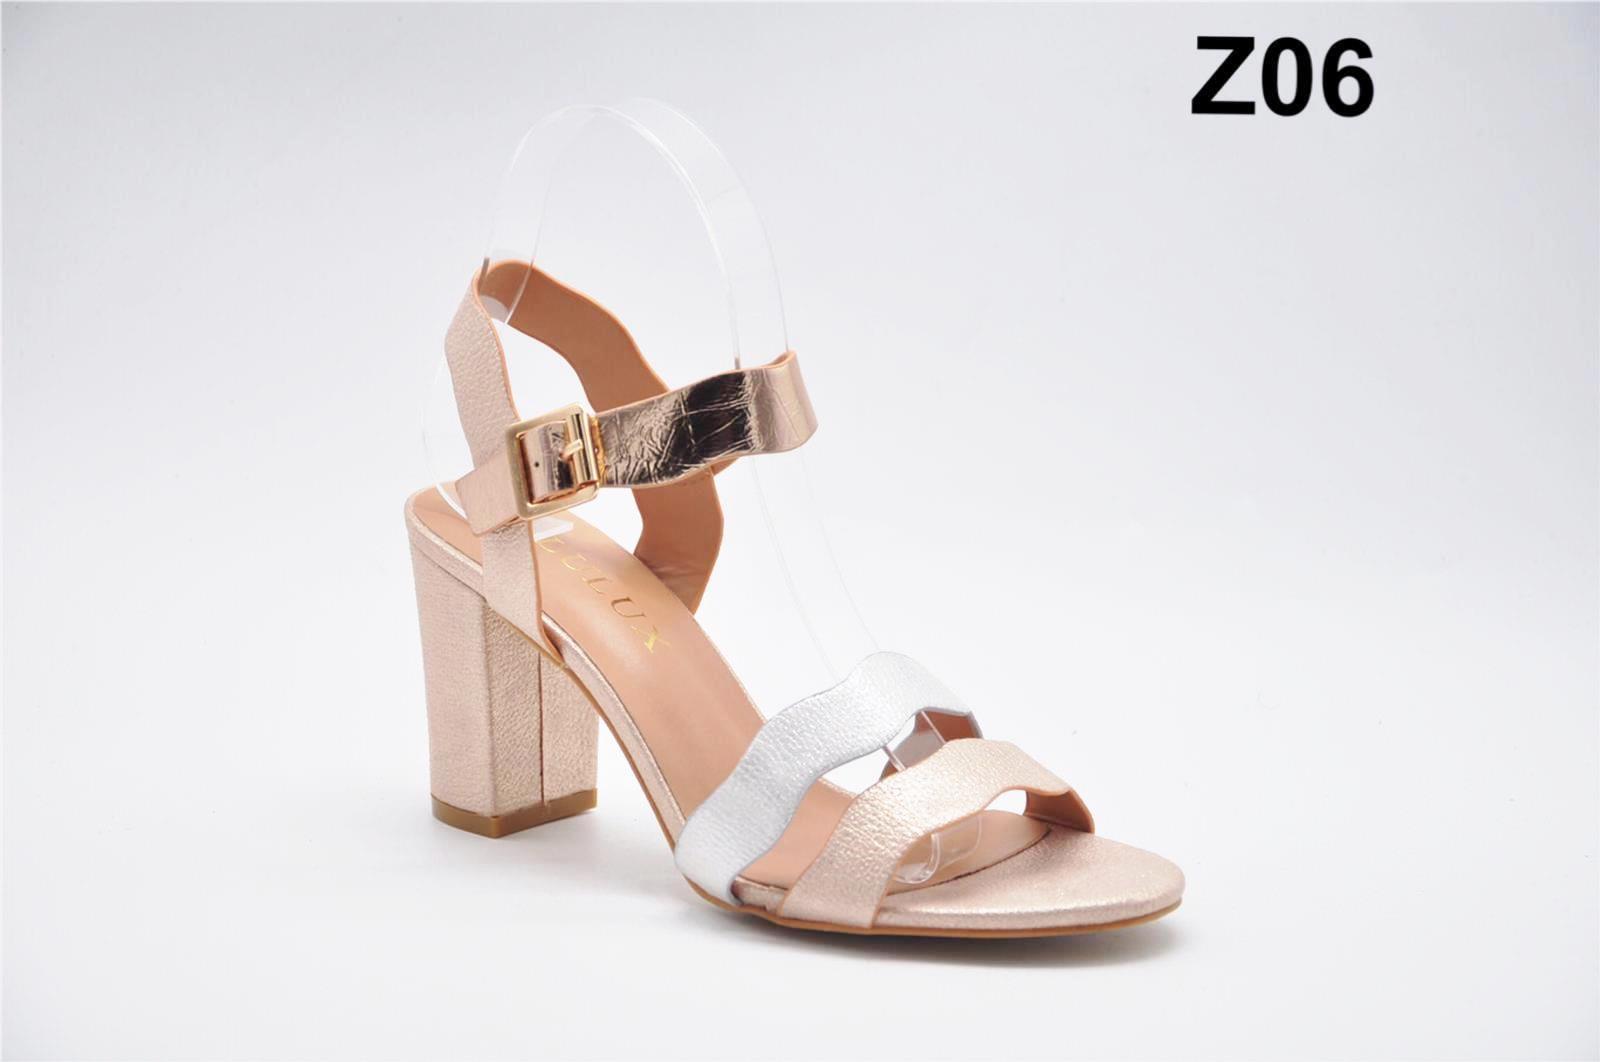 Sandale dama roz aurii Erika